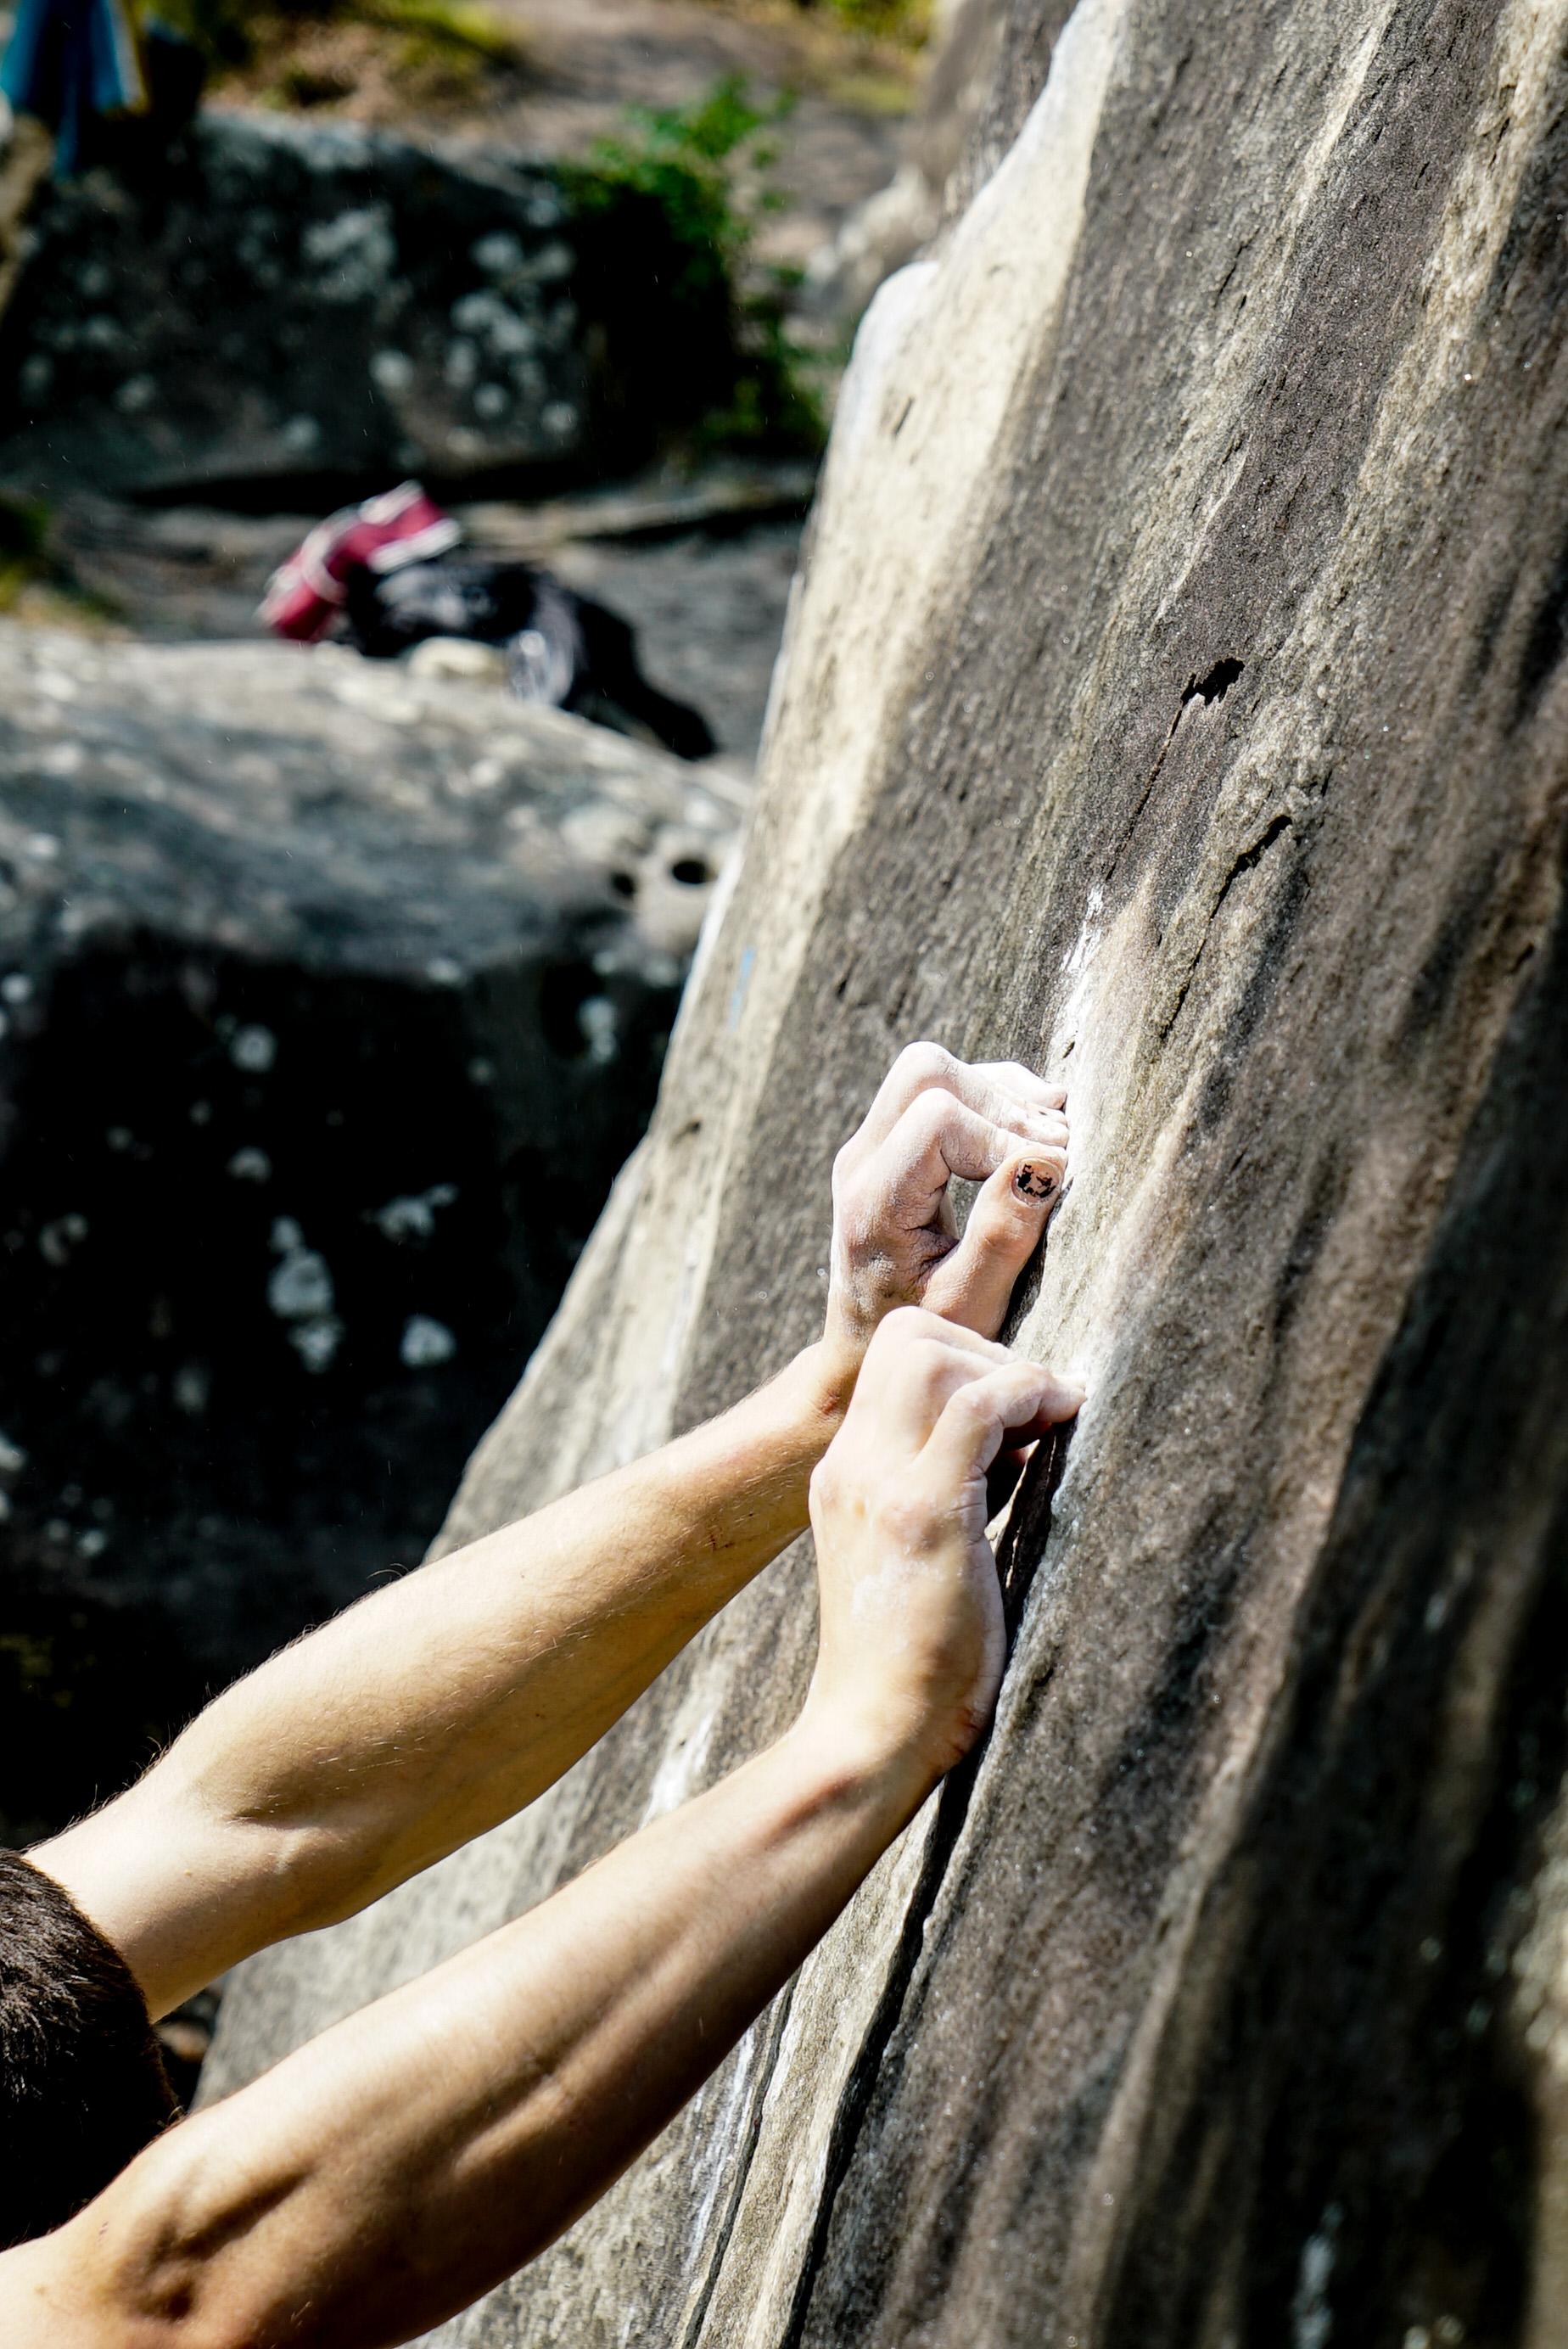 fontainbleau climbing 2016 mike brindley-75